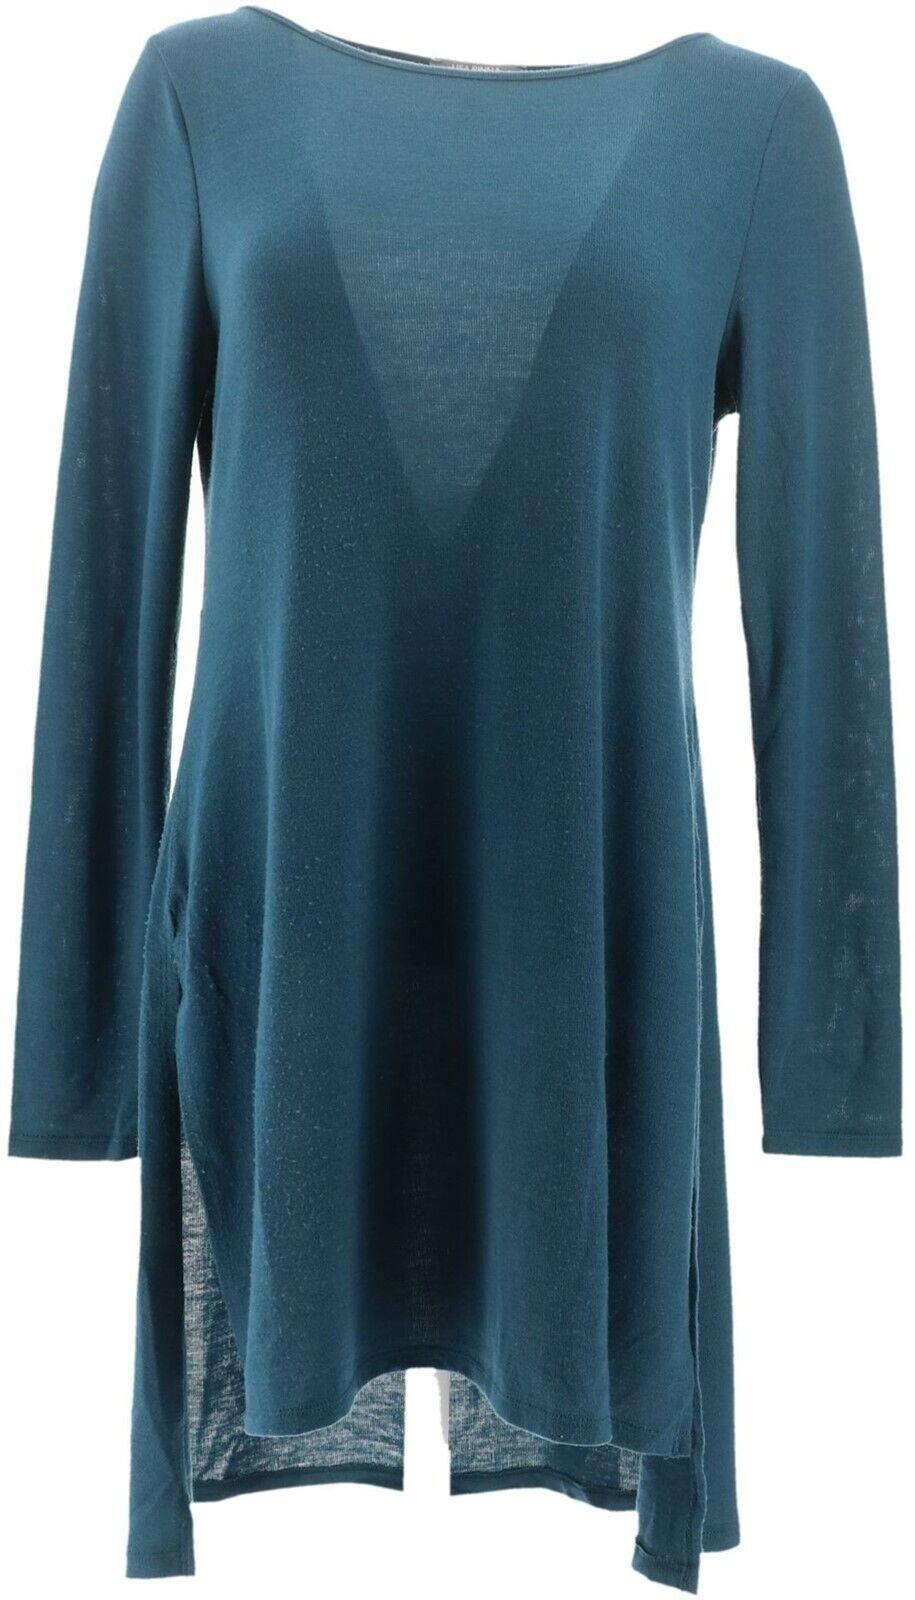 Isaac Mizrahi Essentials Long Slv Knit Tunic Charcoal XS NEW A256464